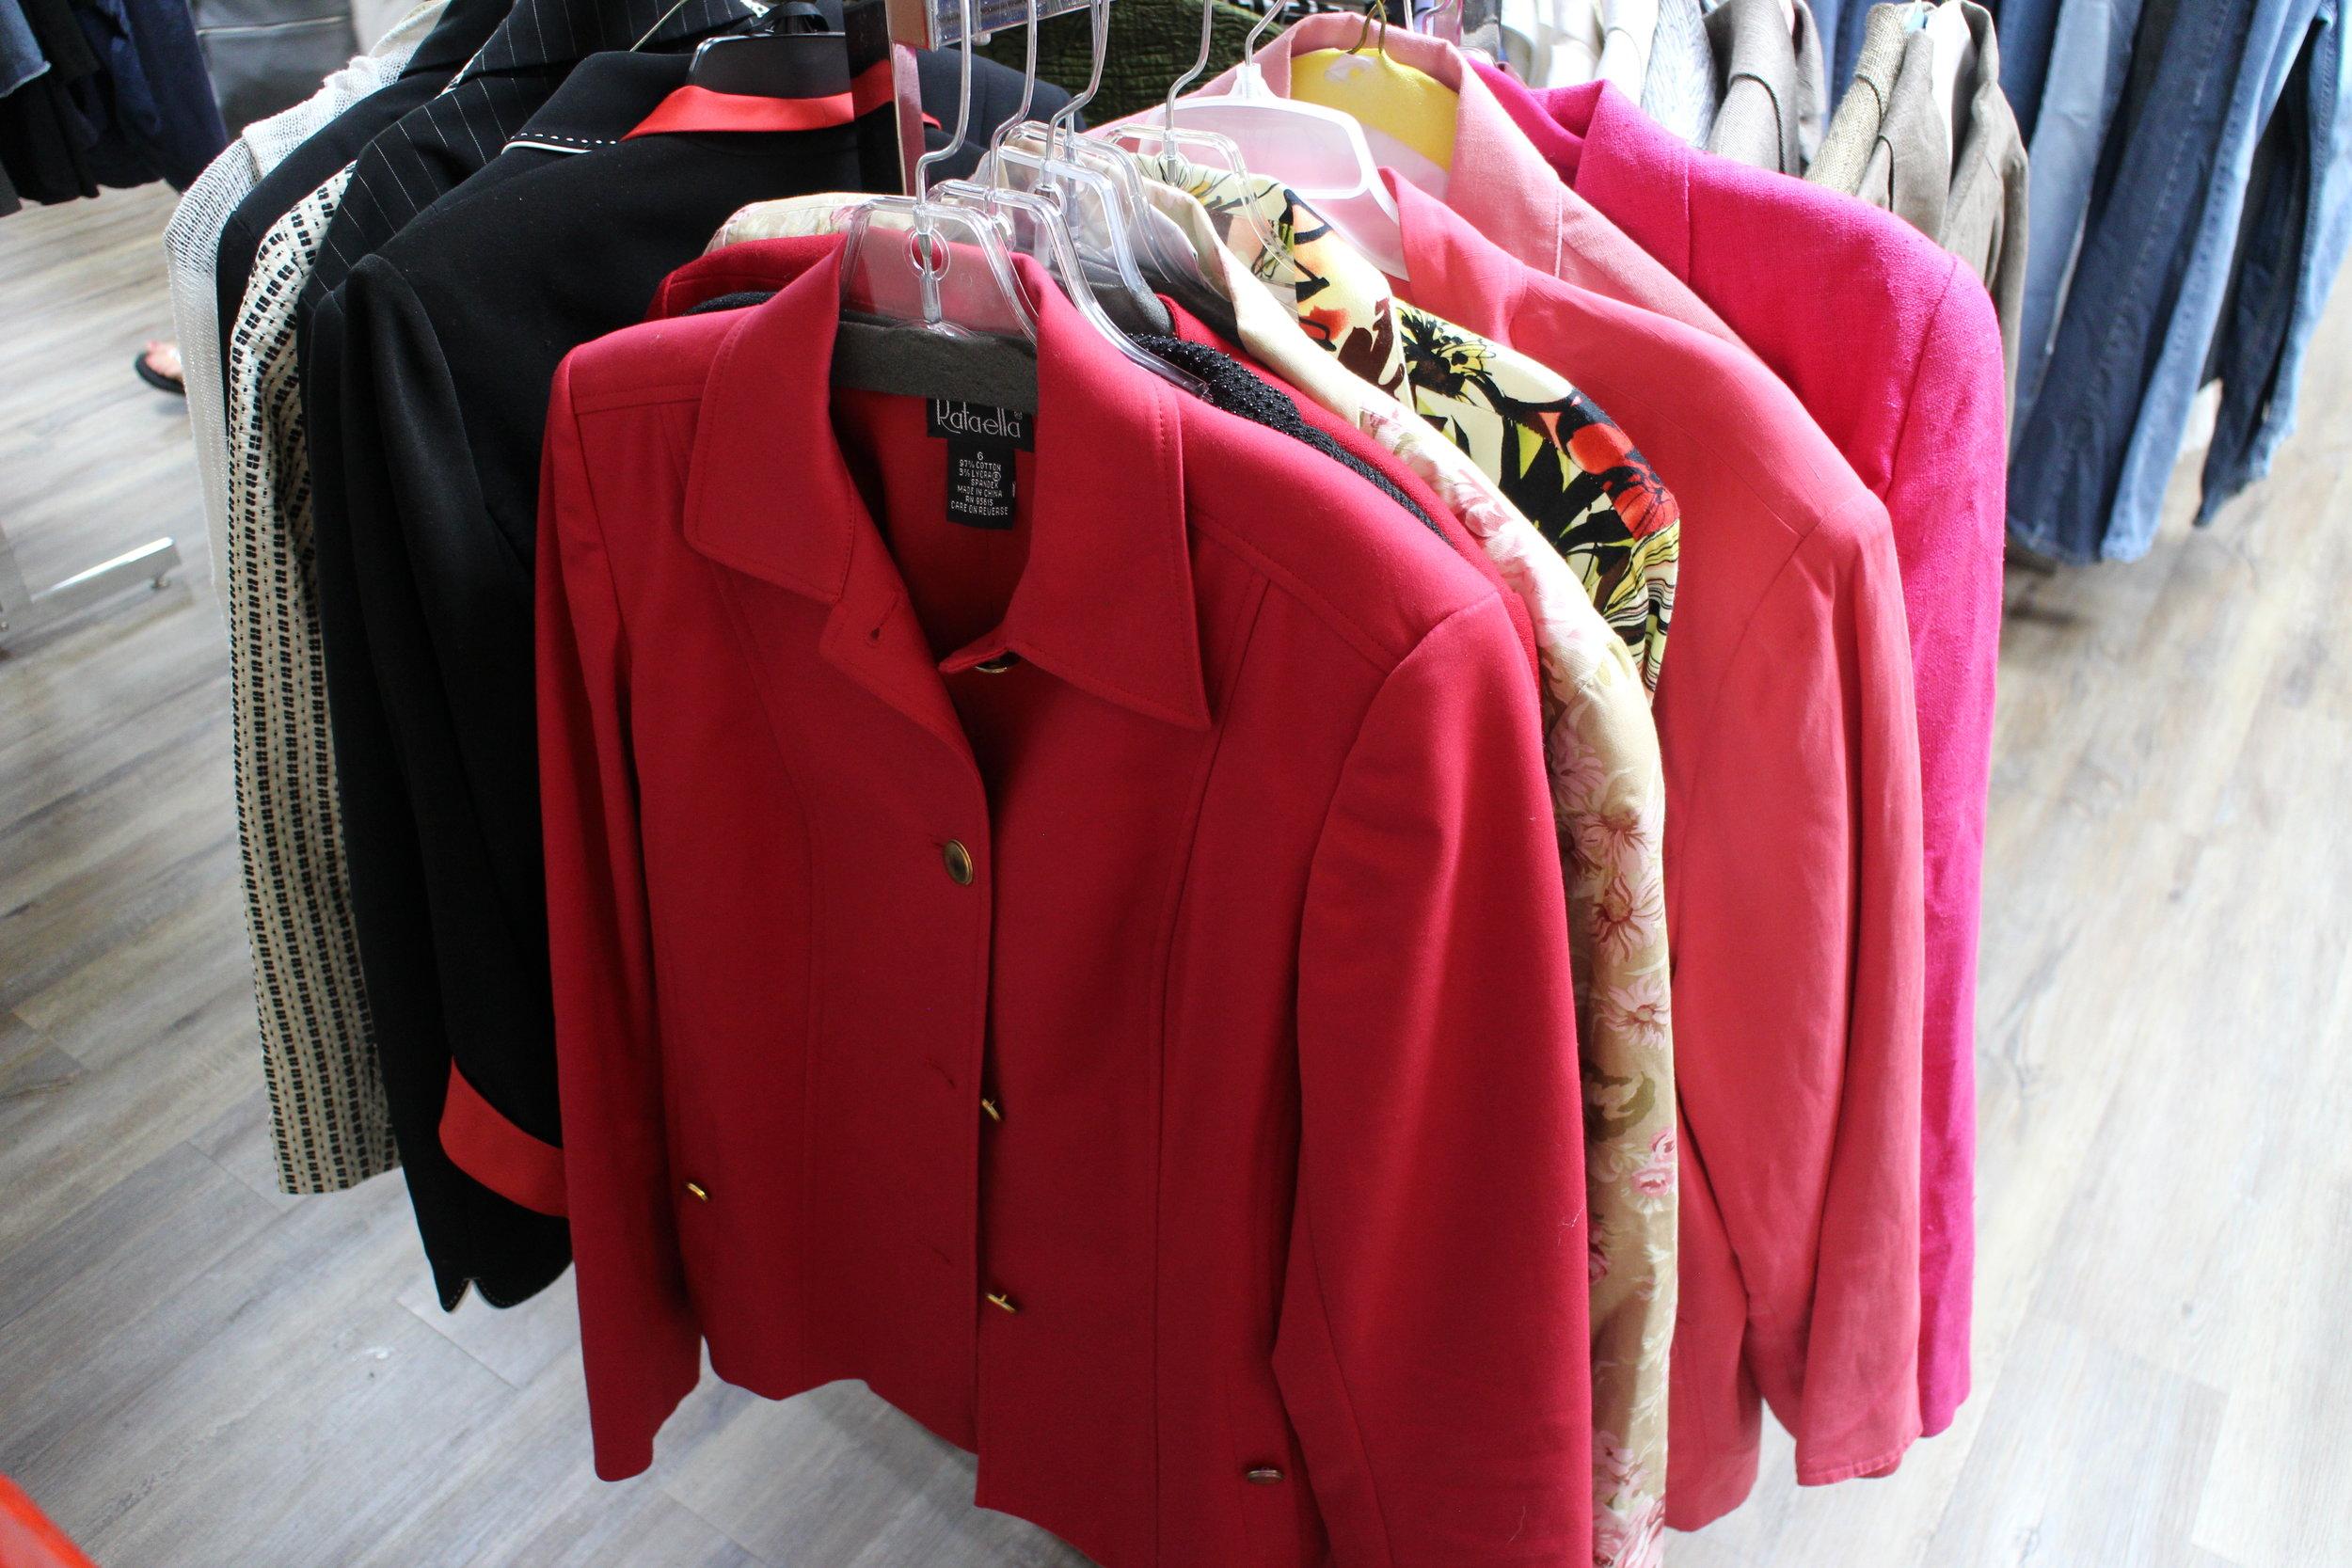 Thrift stores -